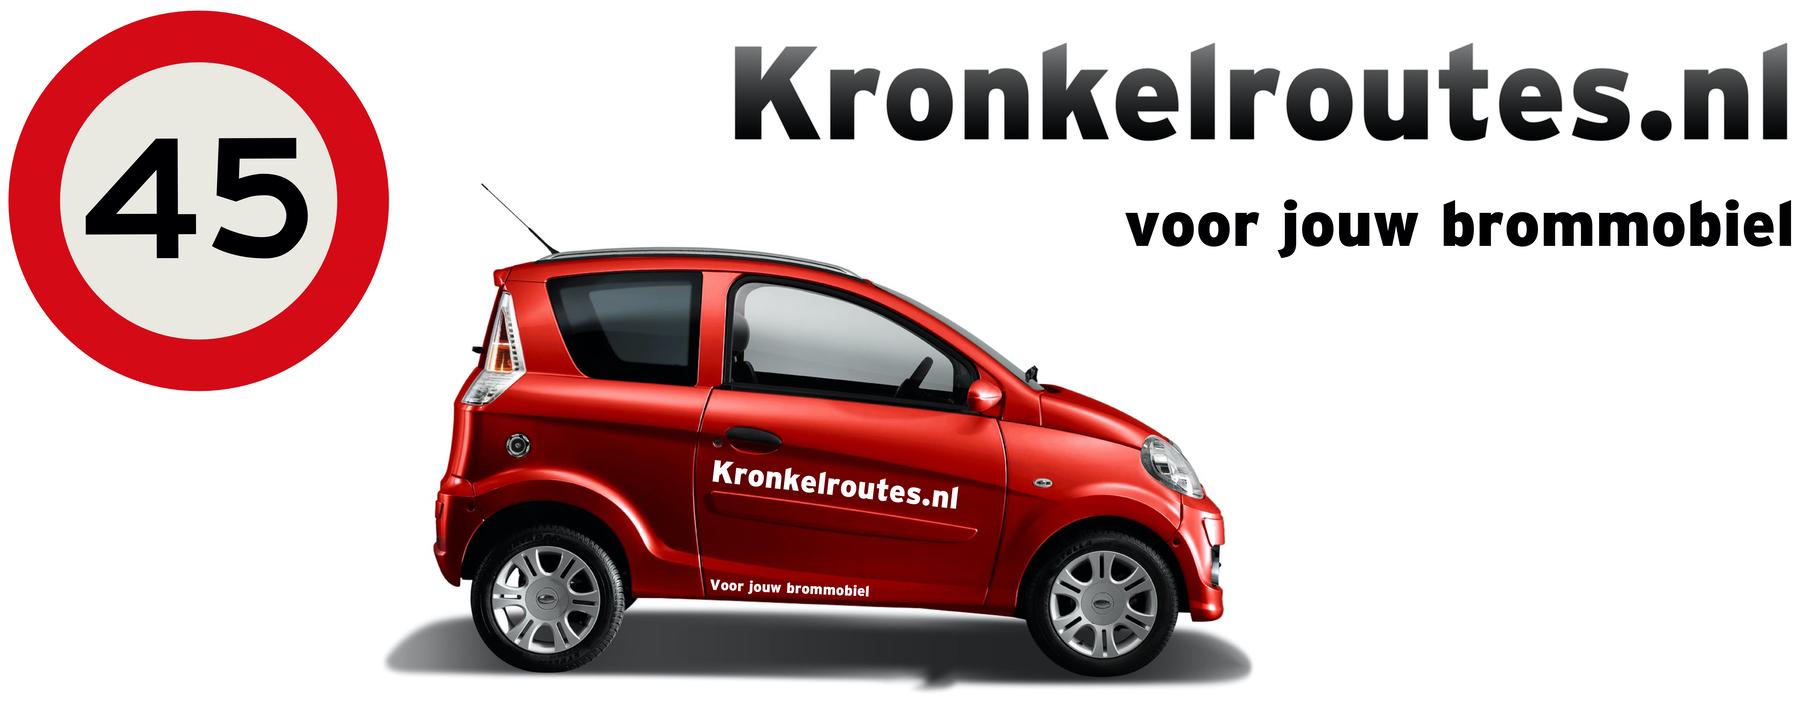 Kronkelroutes.nl